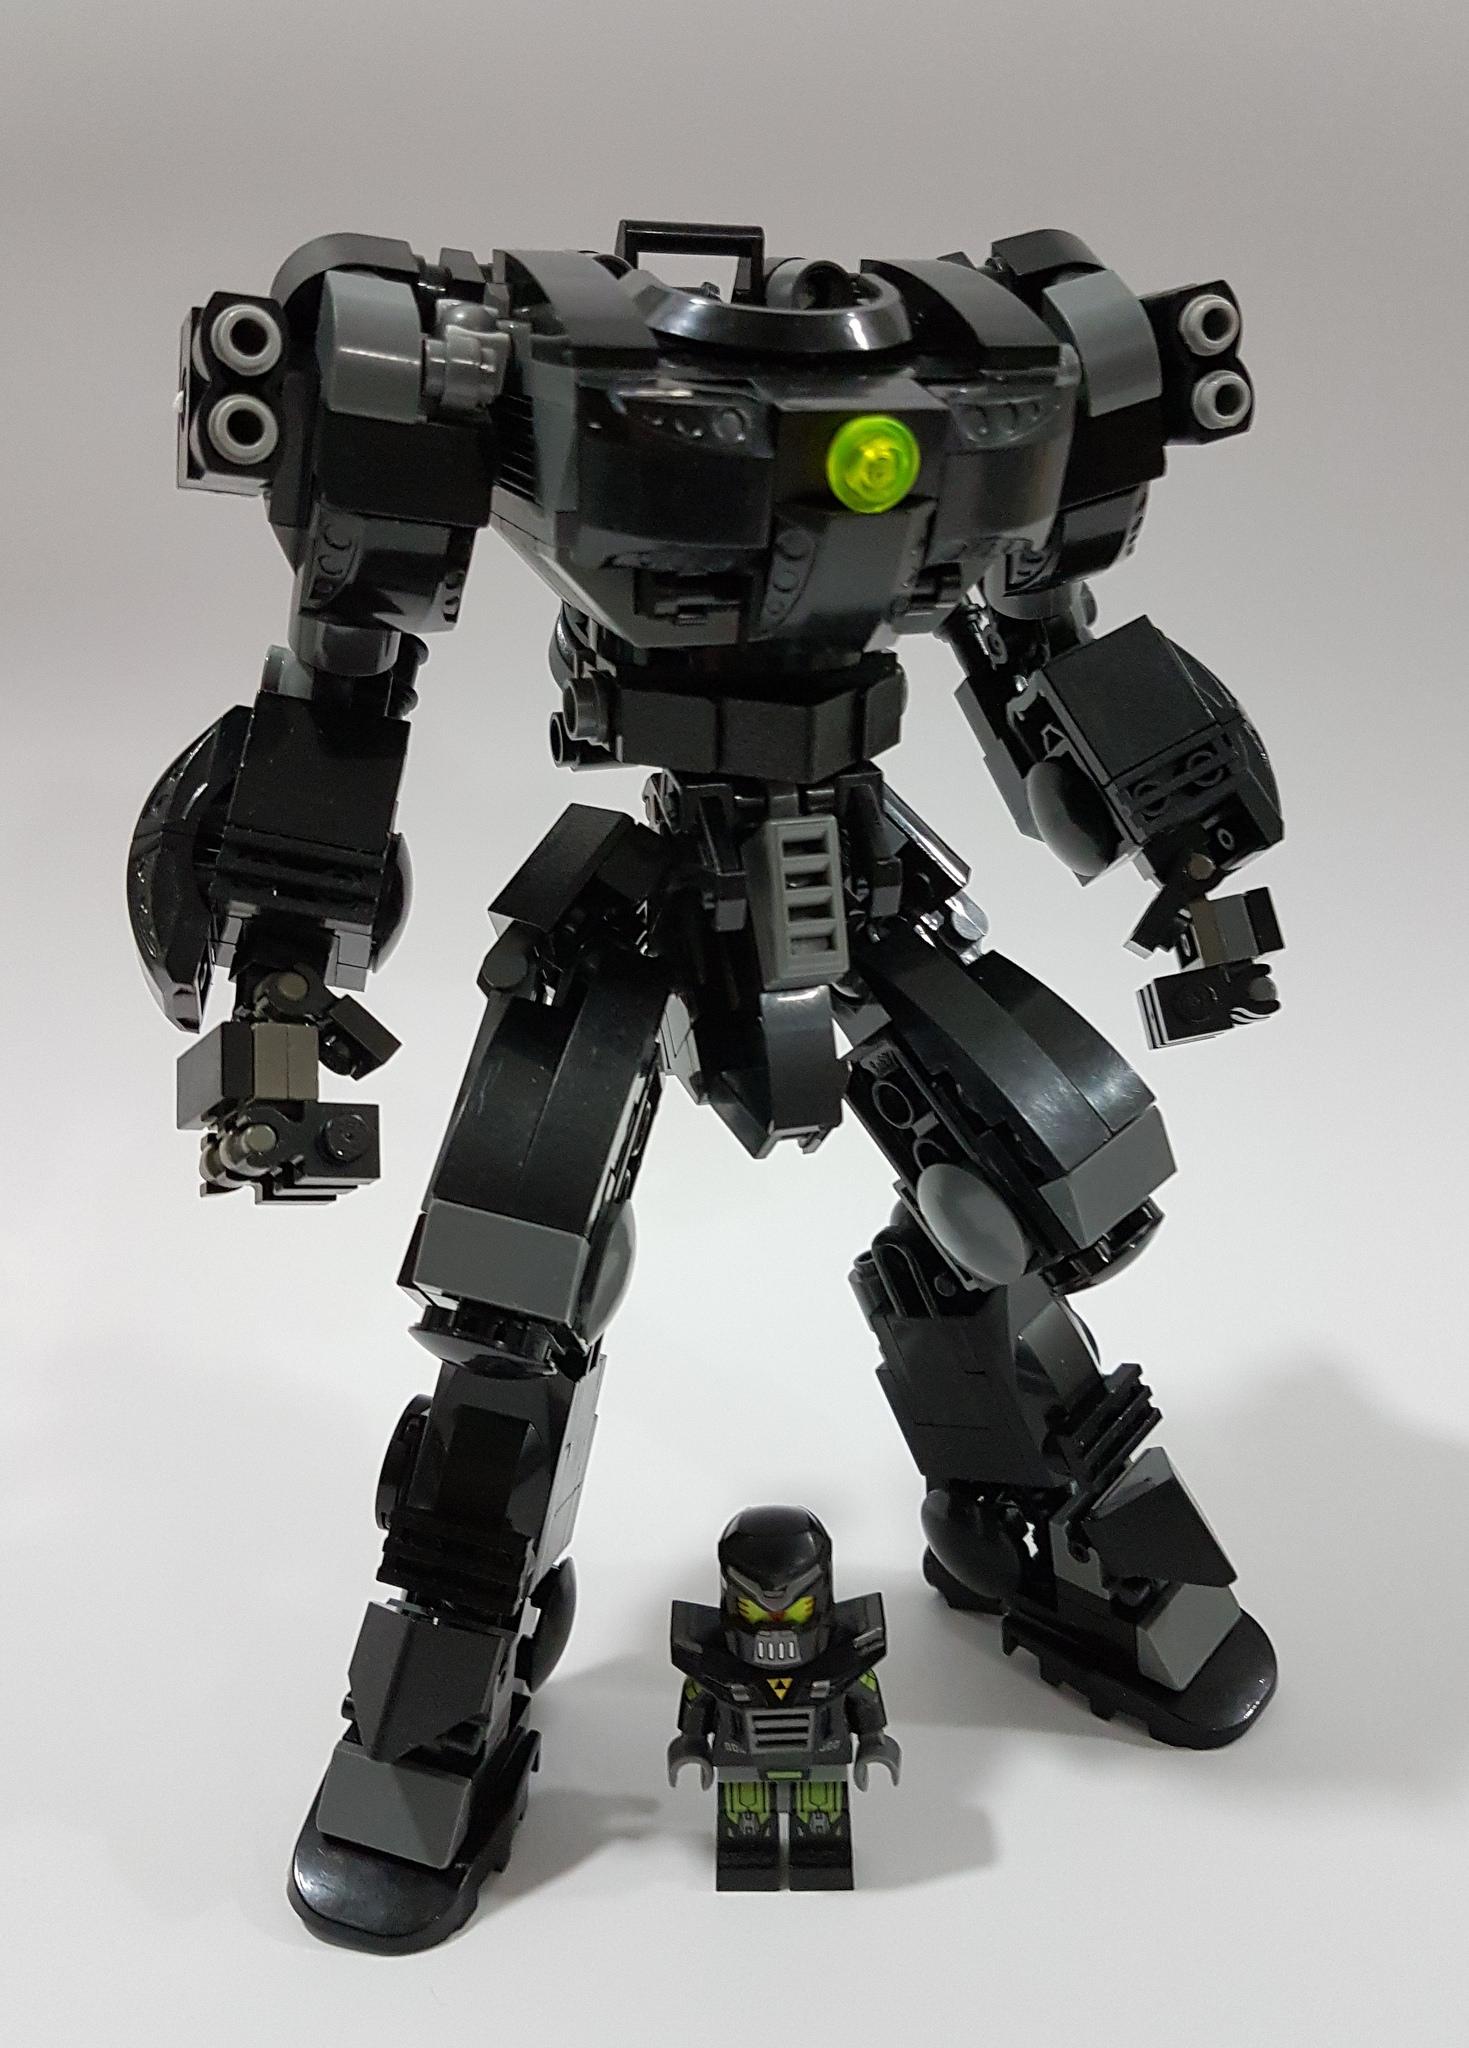 Il robot diavolo veste LEGO #LegaNerd